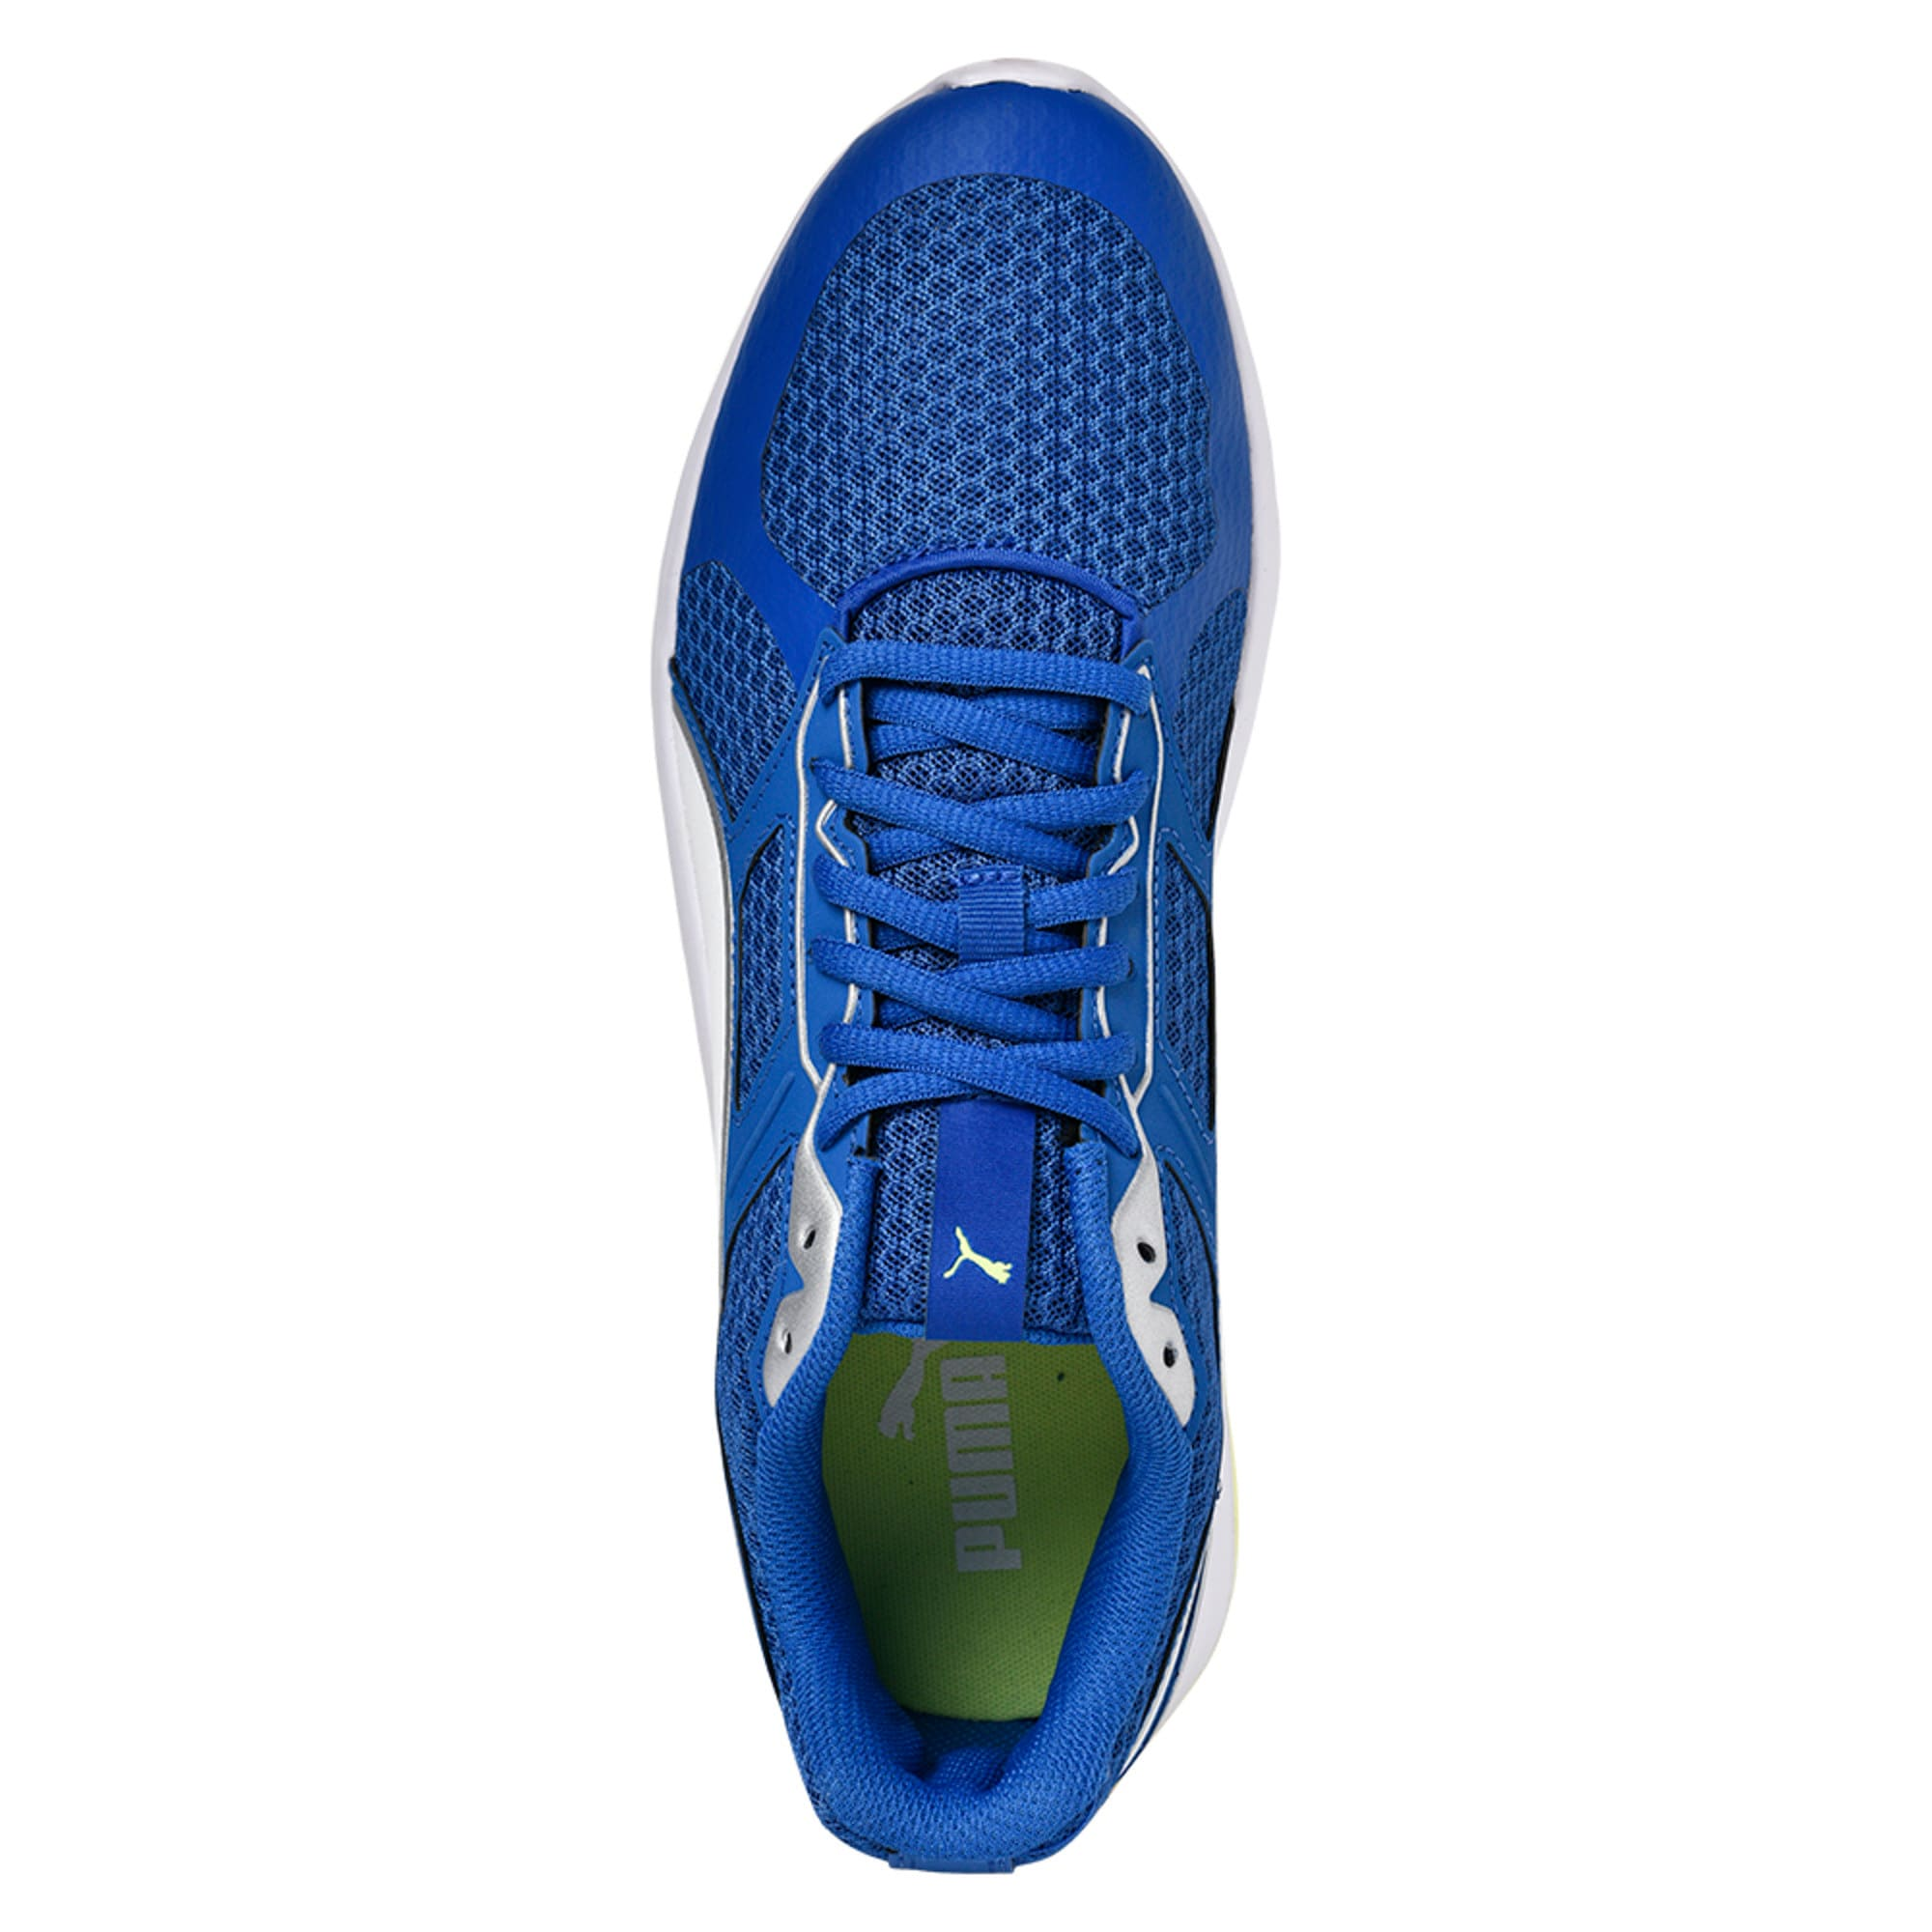 Thumbnail 4 of Escaper Tech Sneakers, Turkish Sea-Puma White, medium-IND